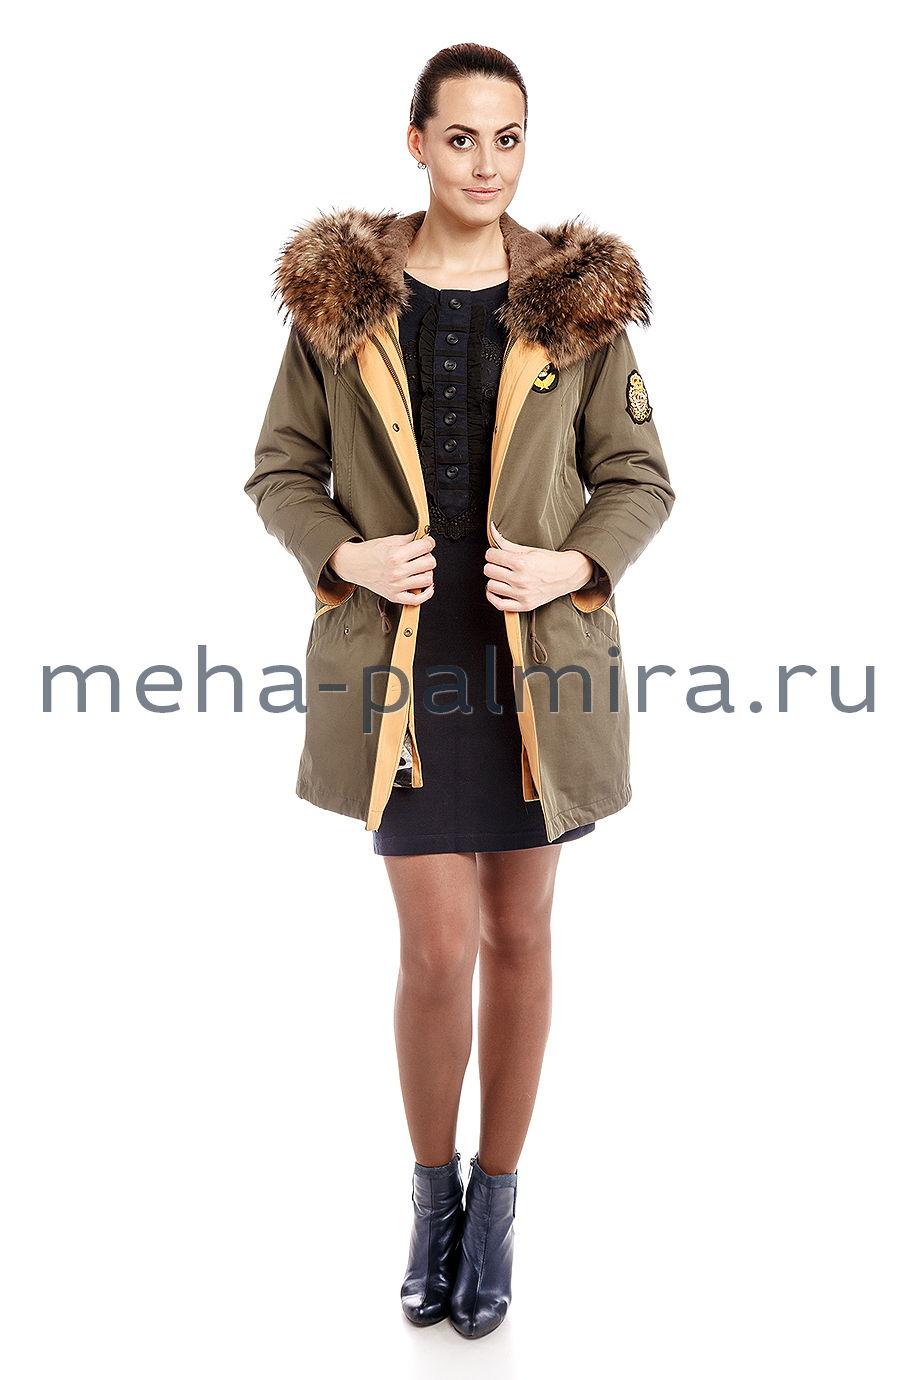 Парка - куртка с капюшоном из меха енота